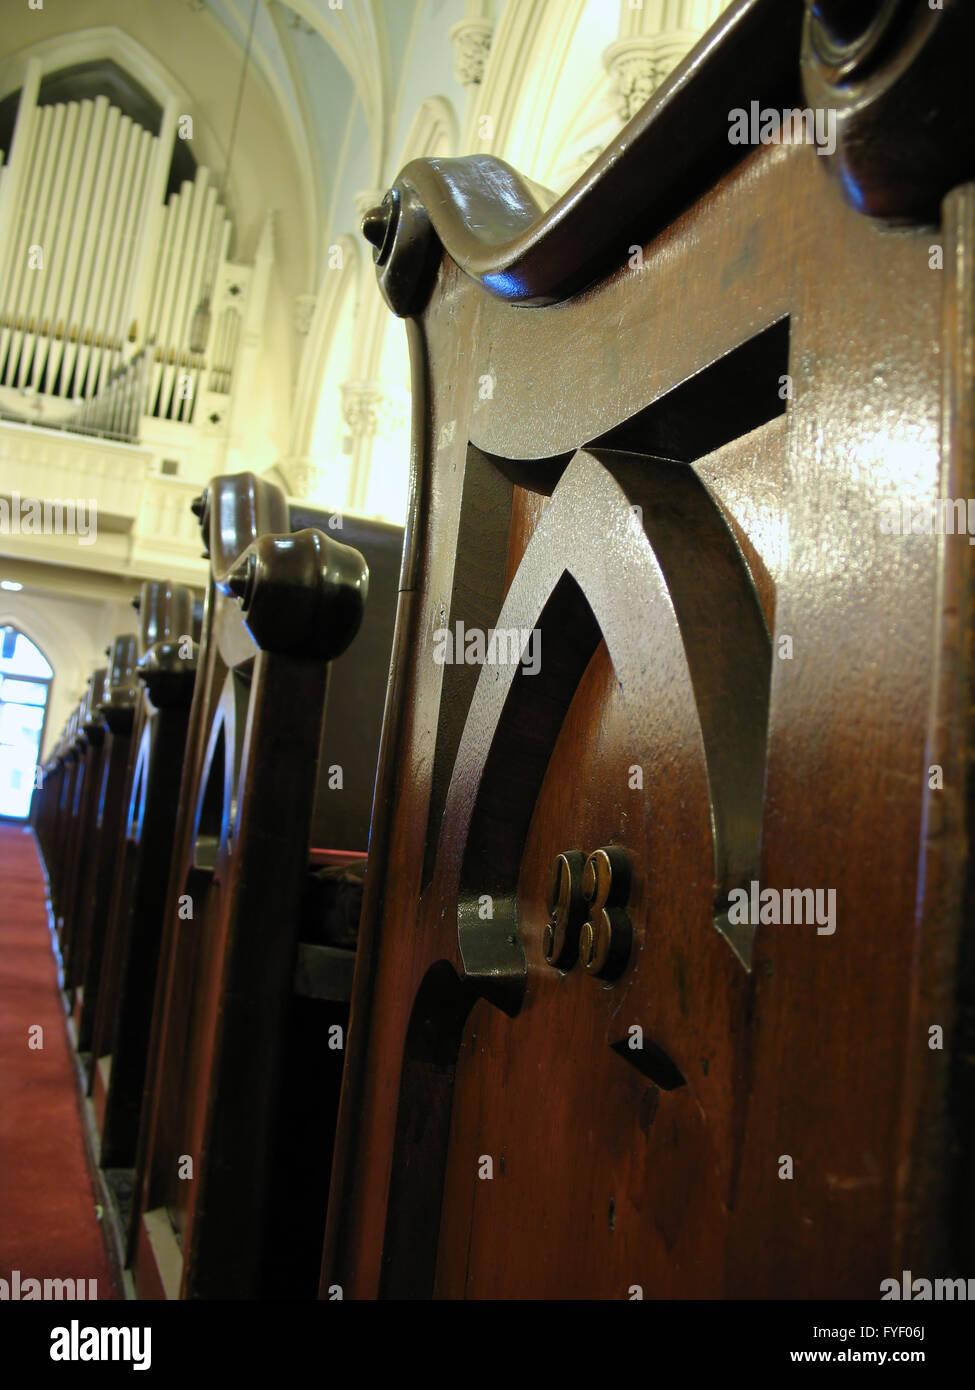 Church organ and pew - Stock Image